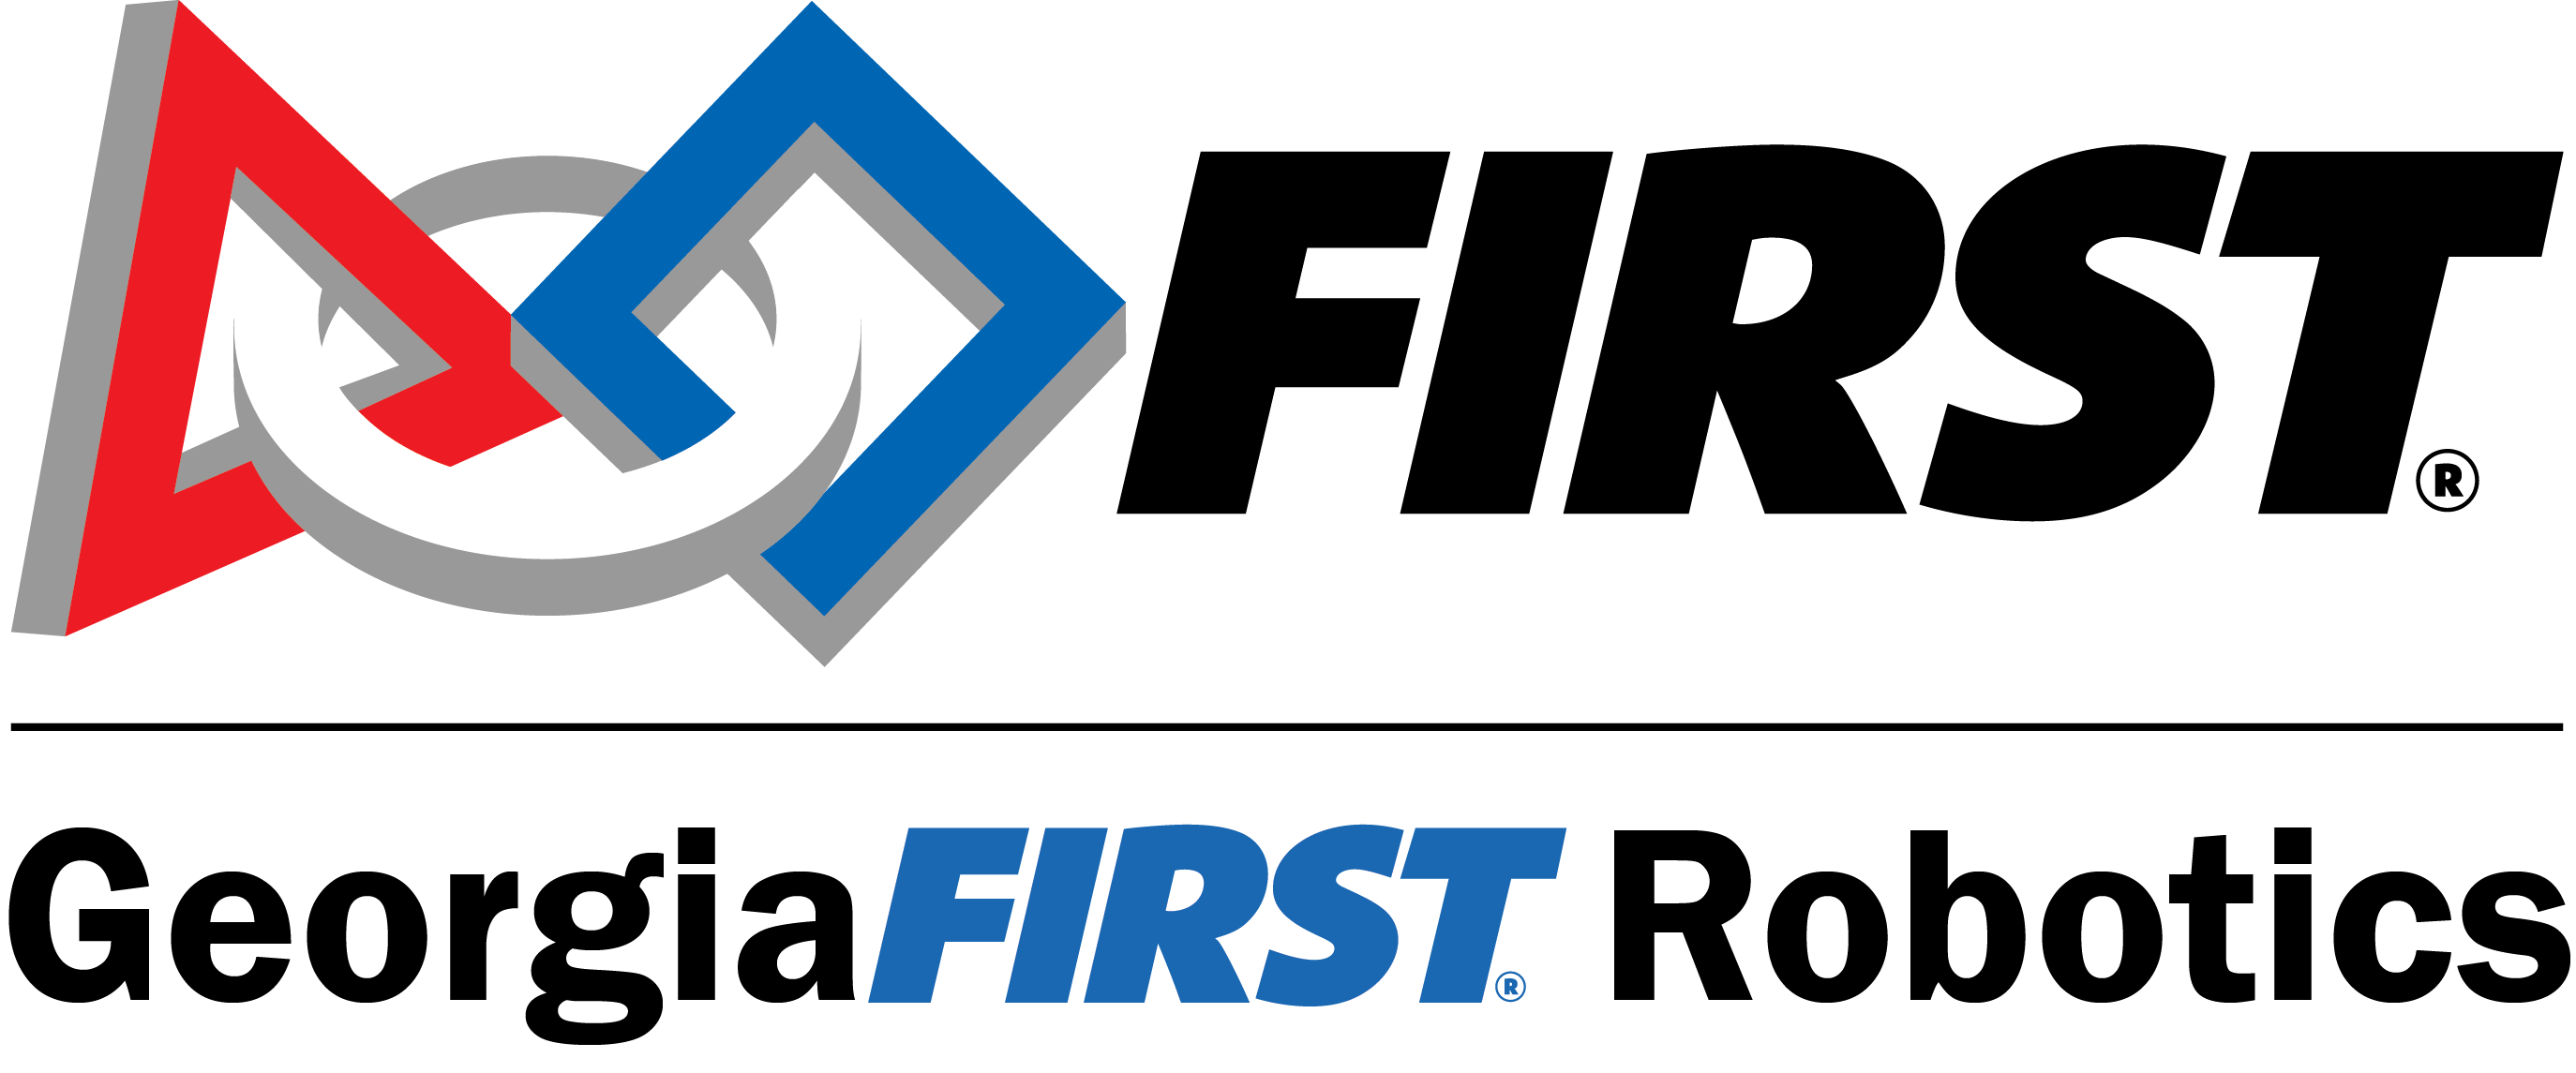 Georgia FIRST Robotics